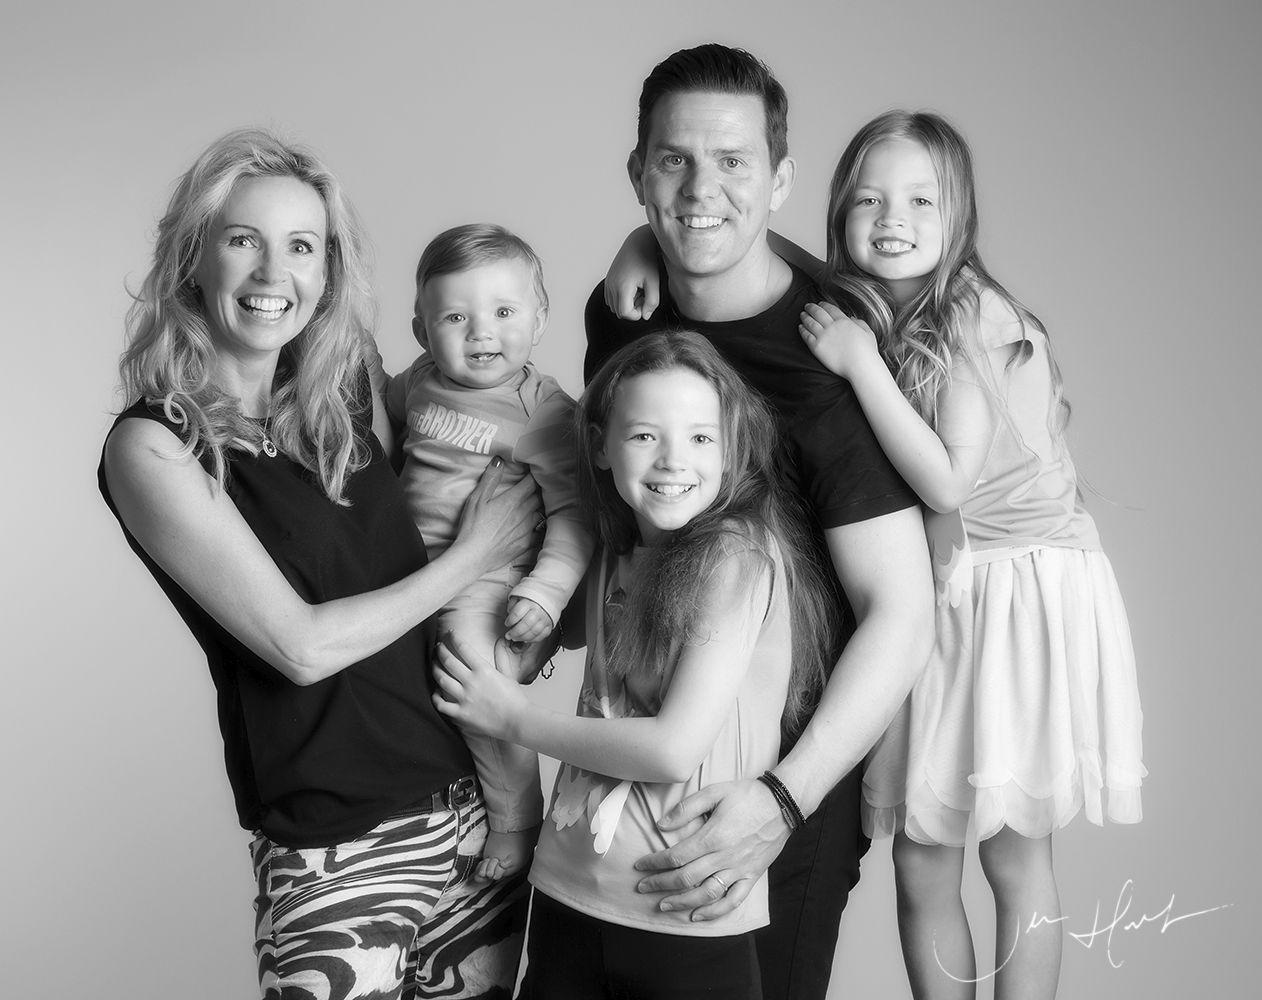 Family-Photography-Studio-Middlesbrough-Jen-Hart- 04June16_010-BW